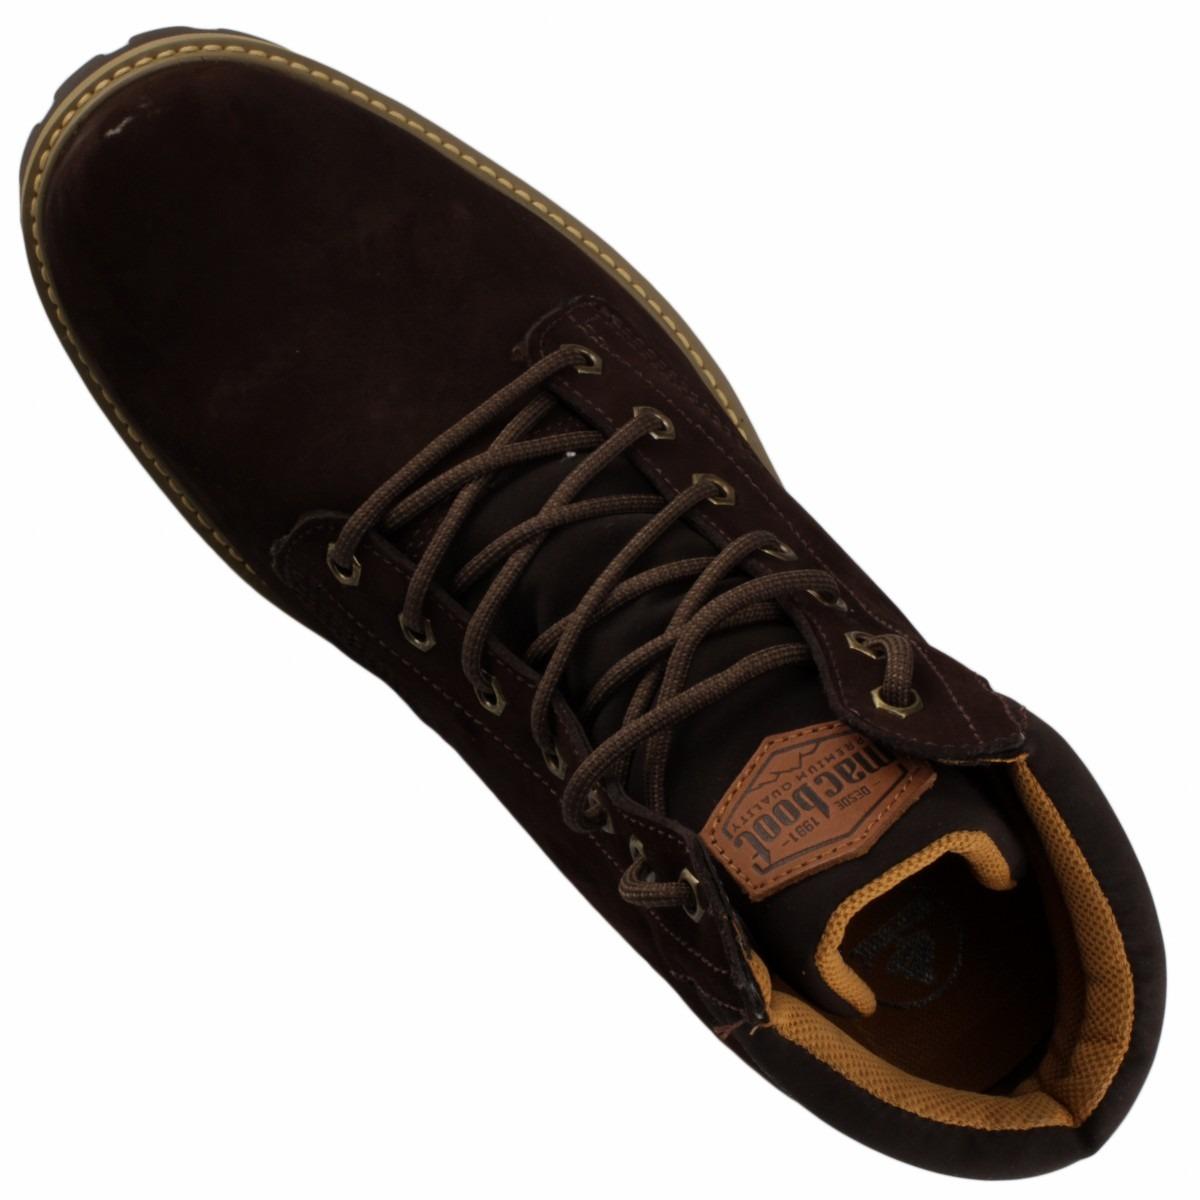 c658169ca9 bota macboot paracatu 02 araxa masculino couro original. Carregando zoom.